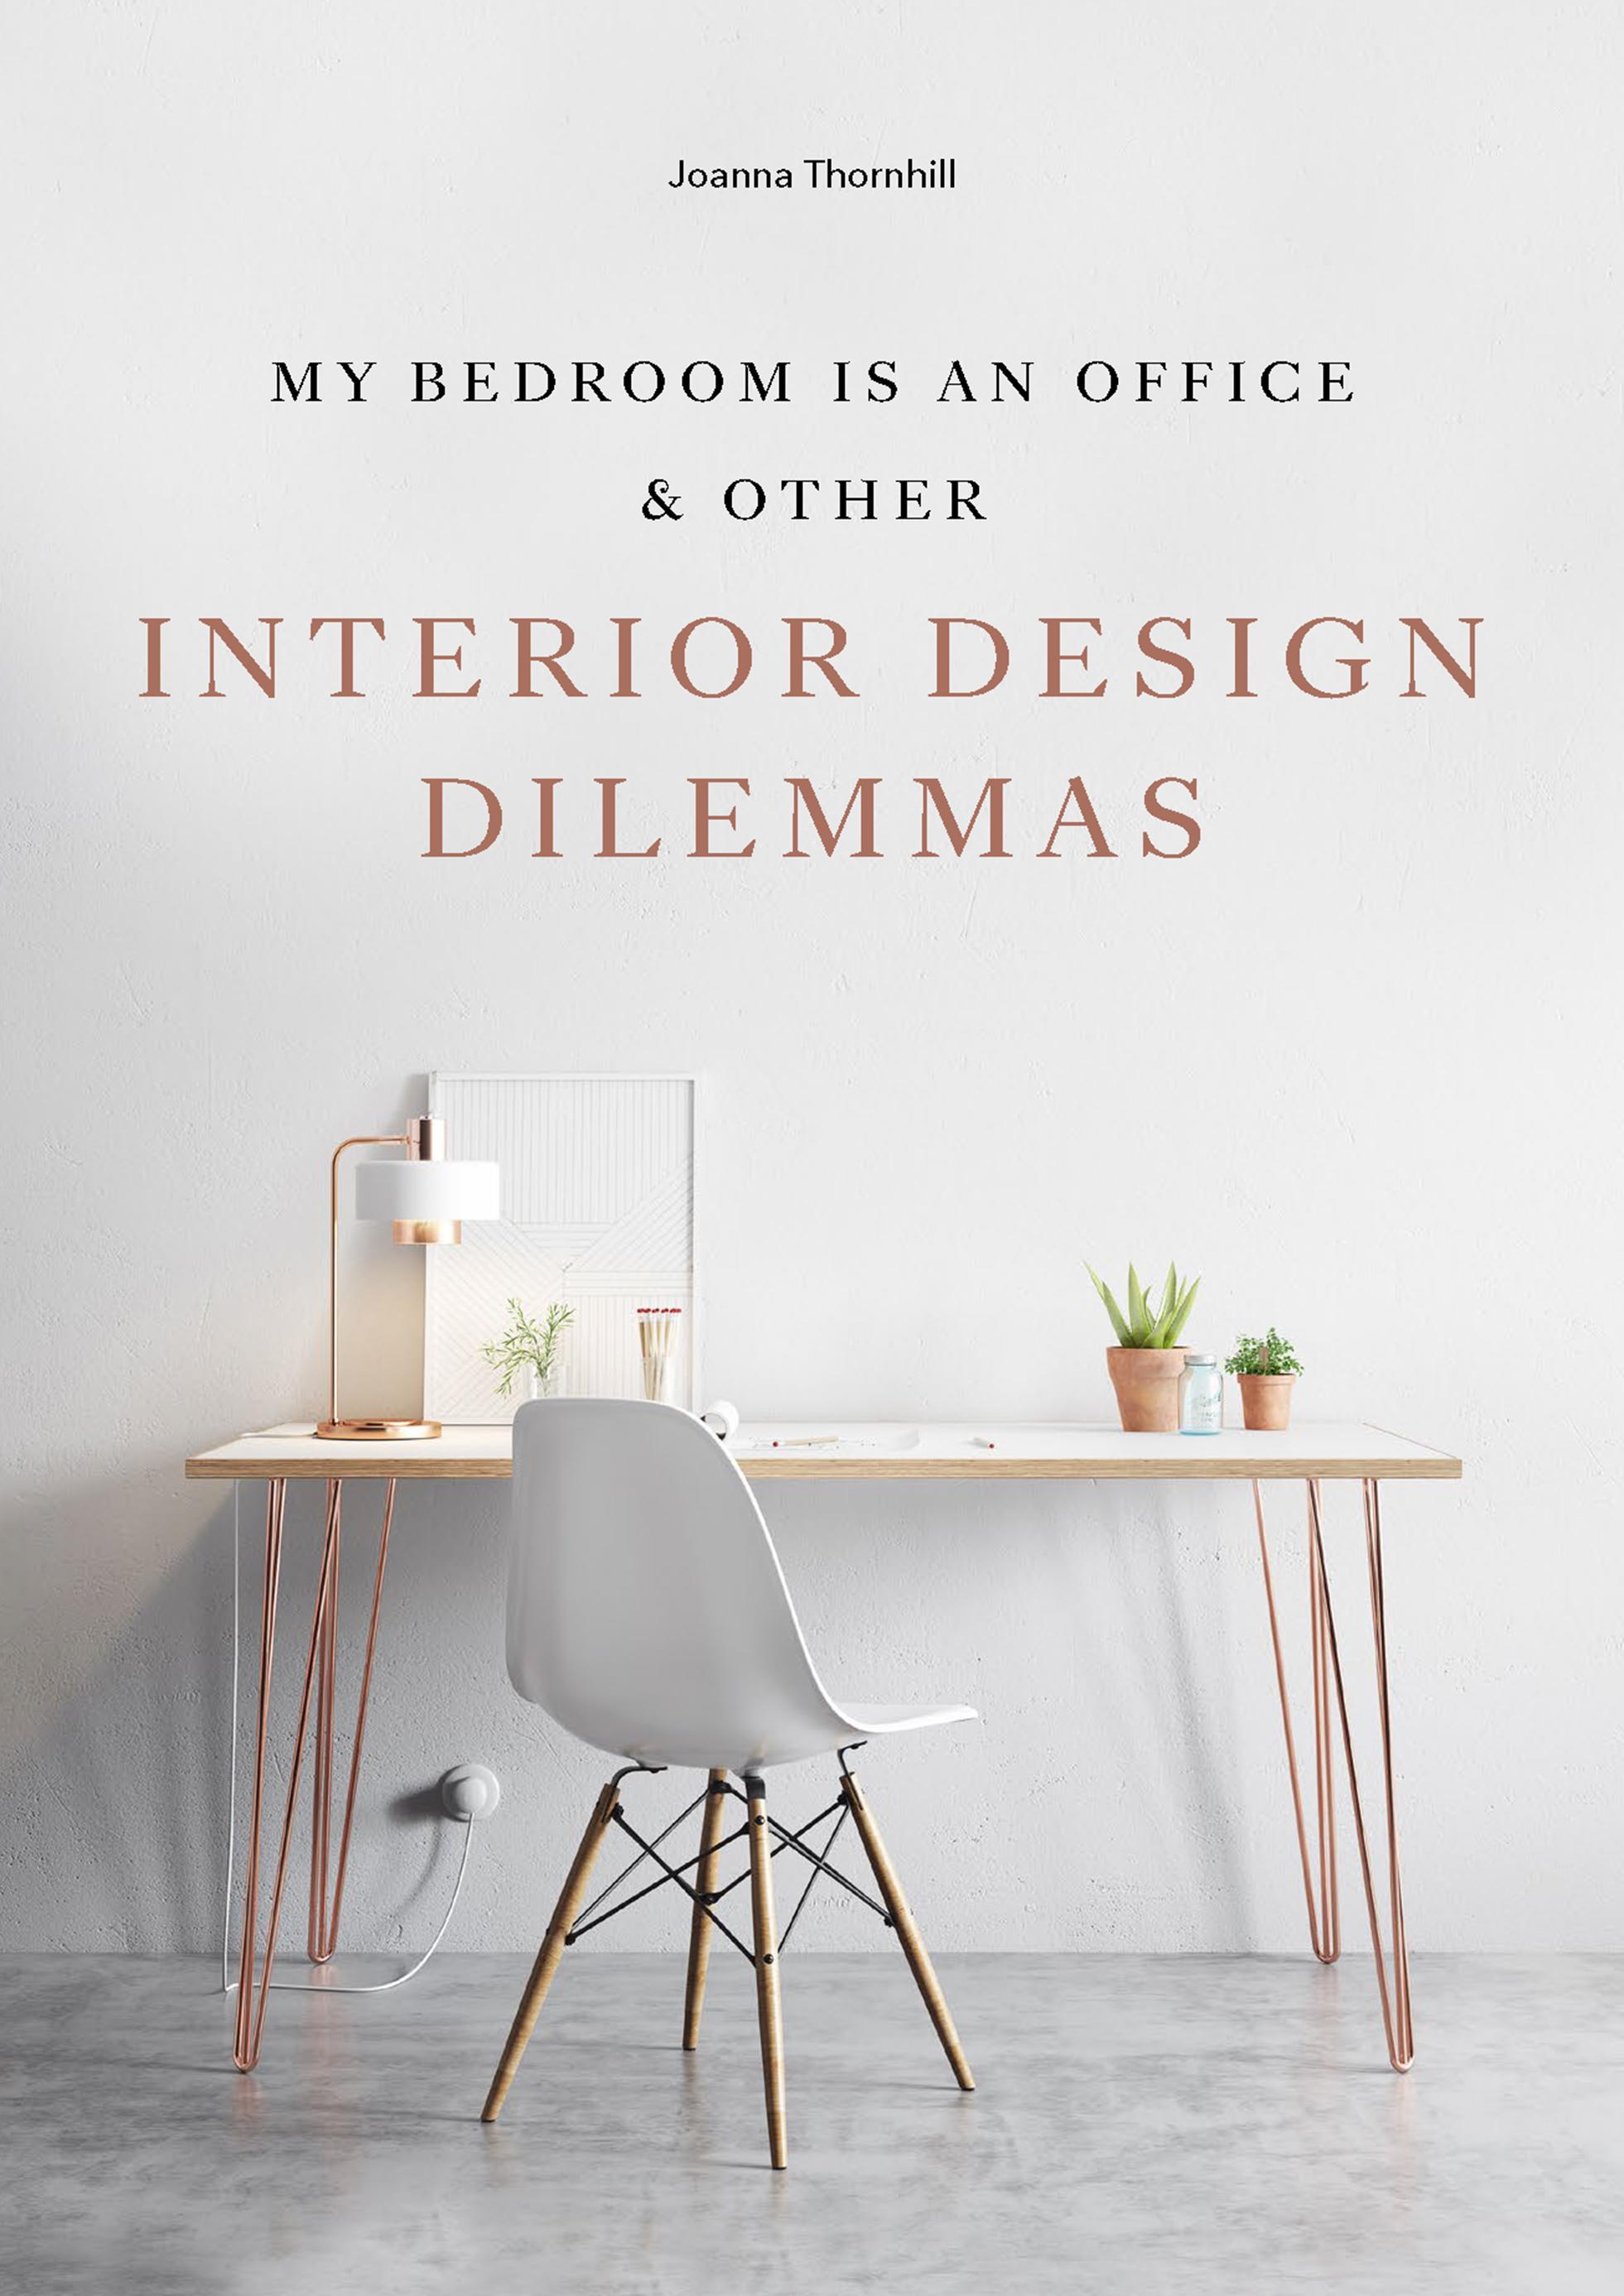 Interior Design Dilemmas Book Cover